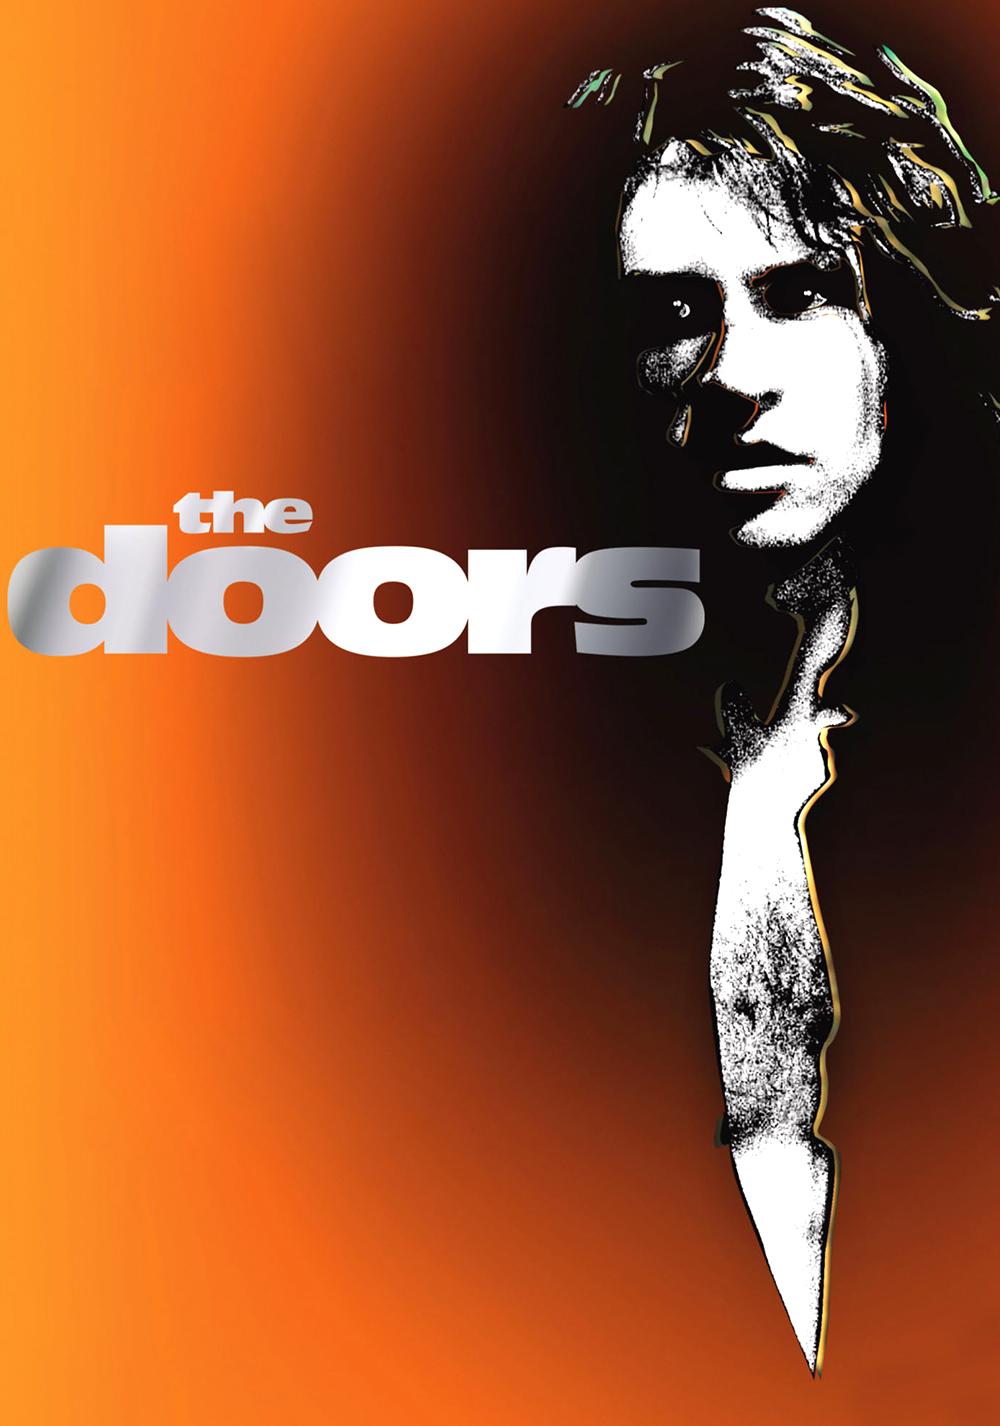 The Doors | Movie fanart | fanart.tv